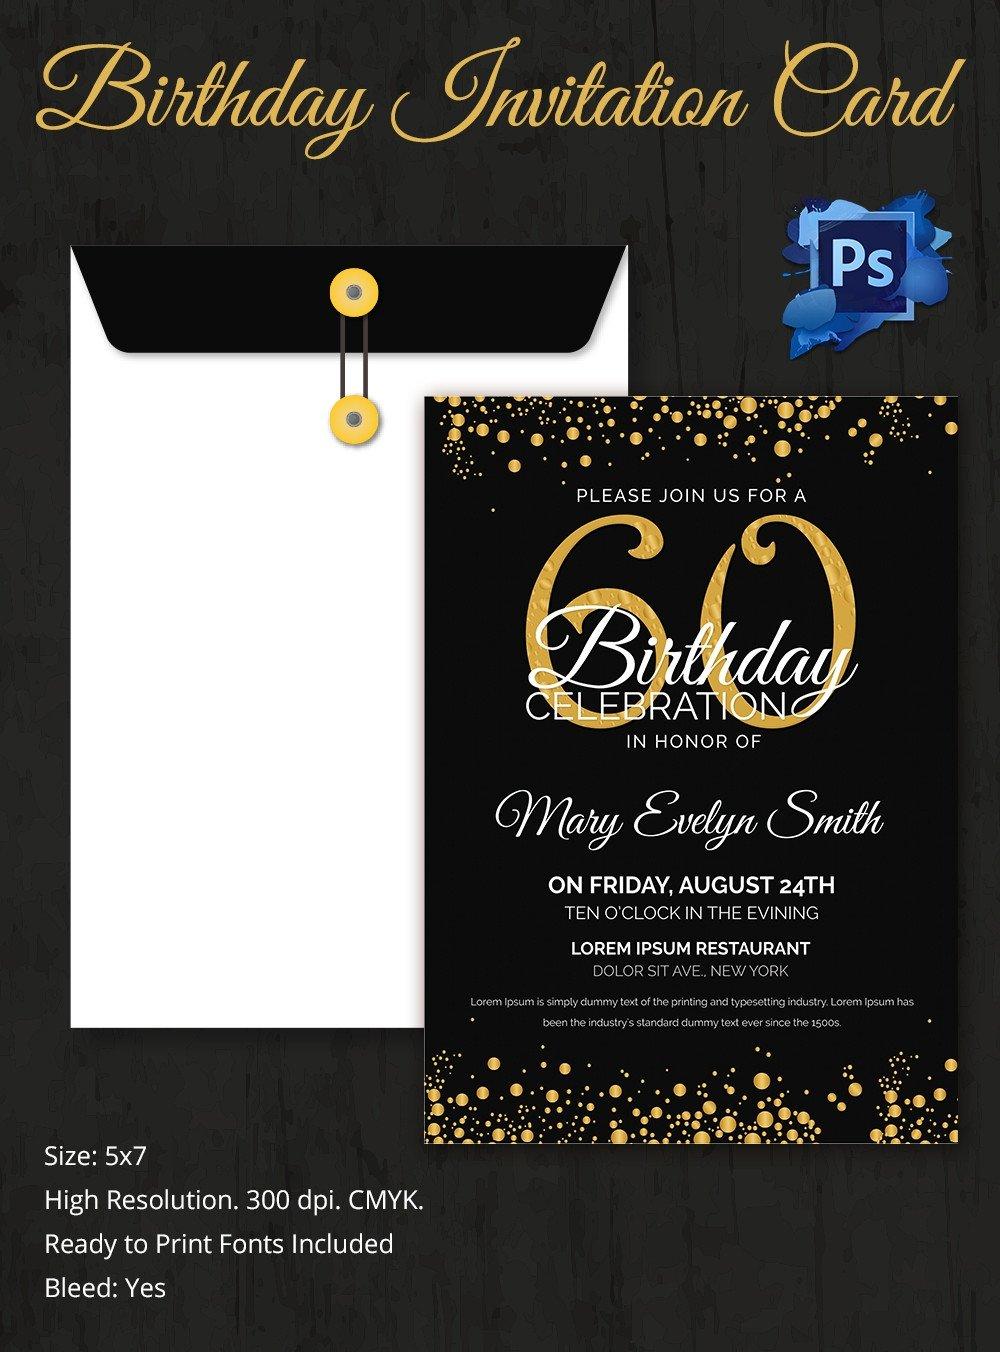 Birthday Invitation Templates Word Birthday Invitation Template 32 Free Word Pdf Psd Ai